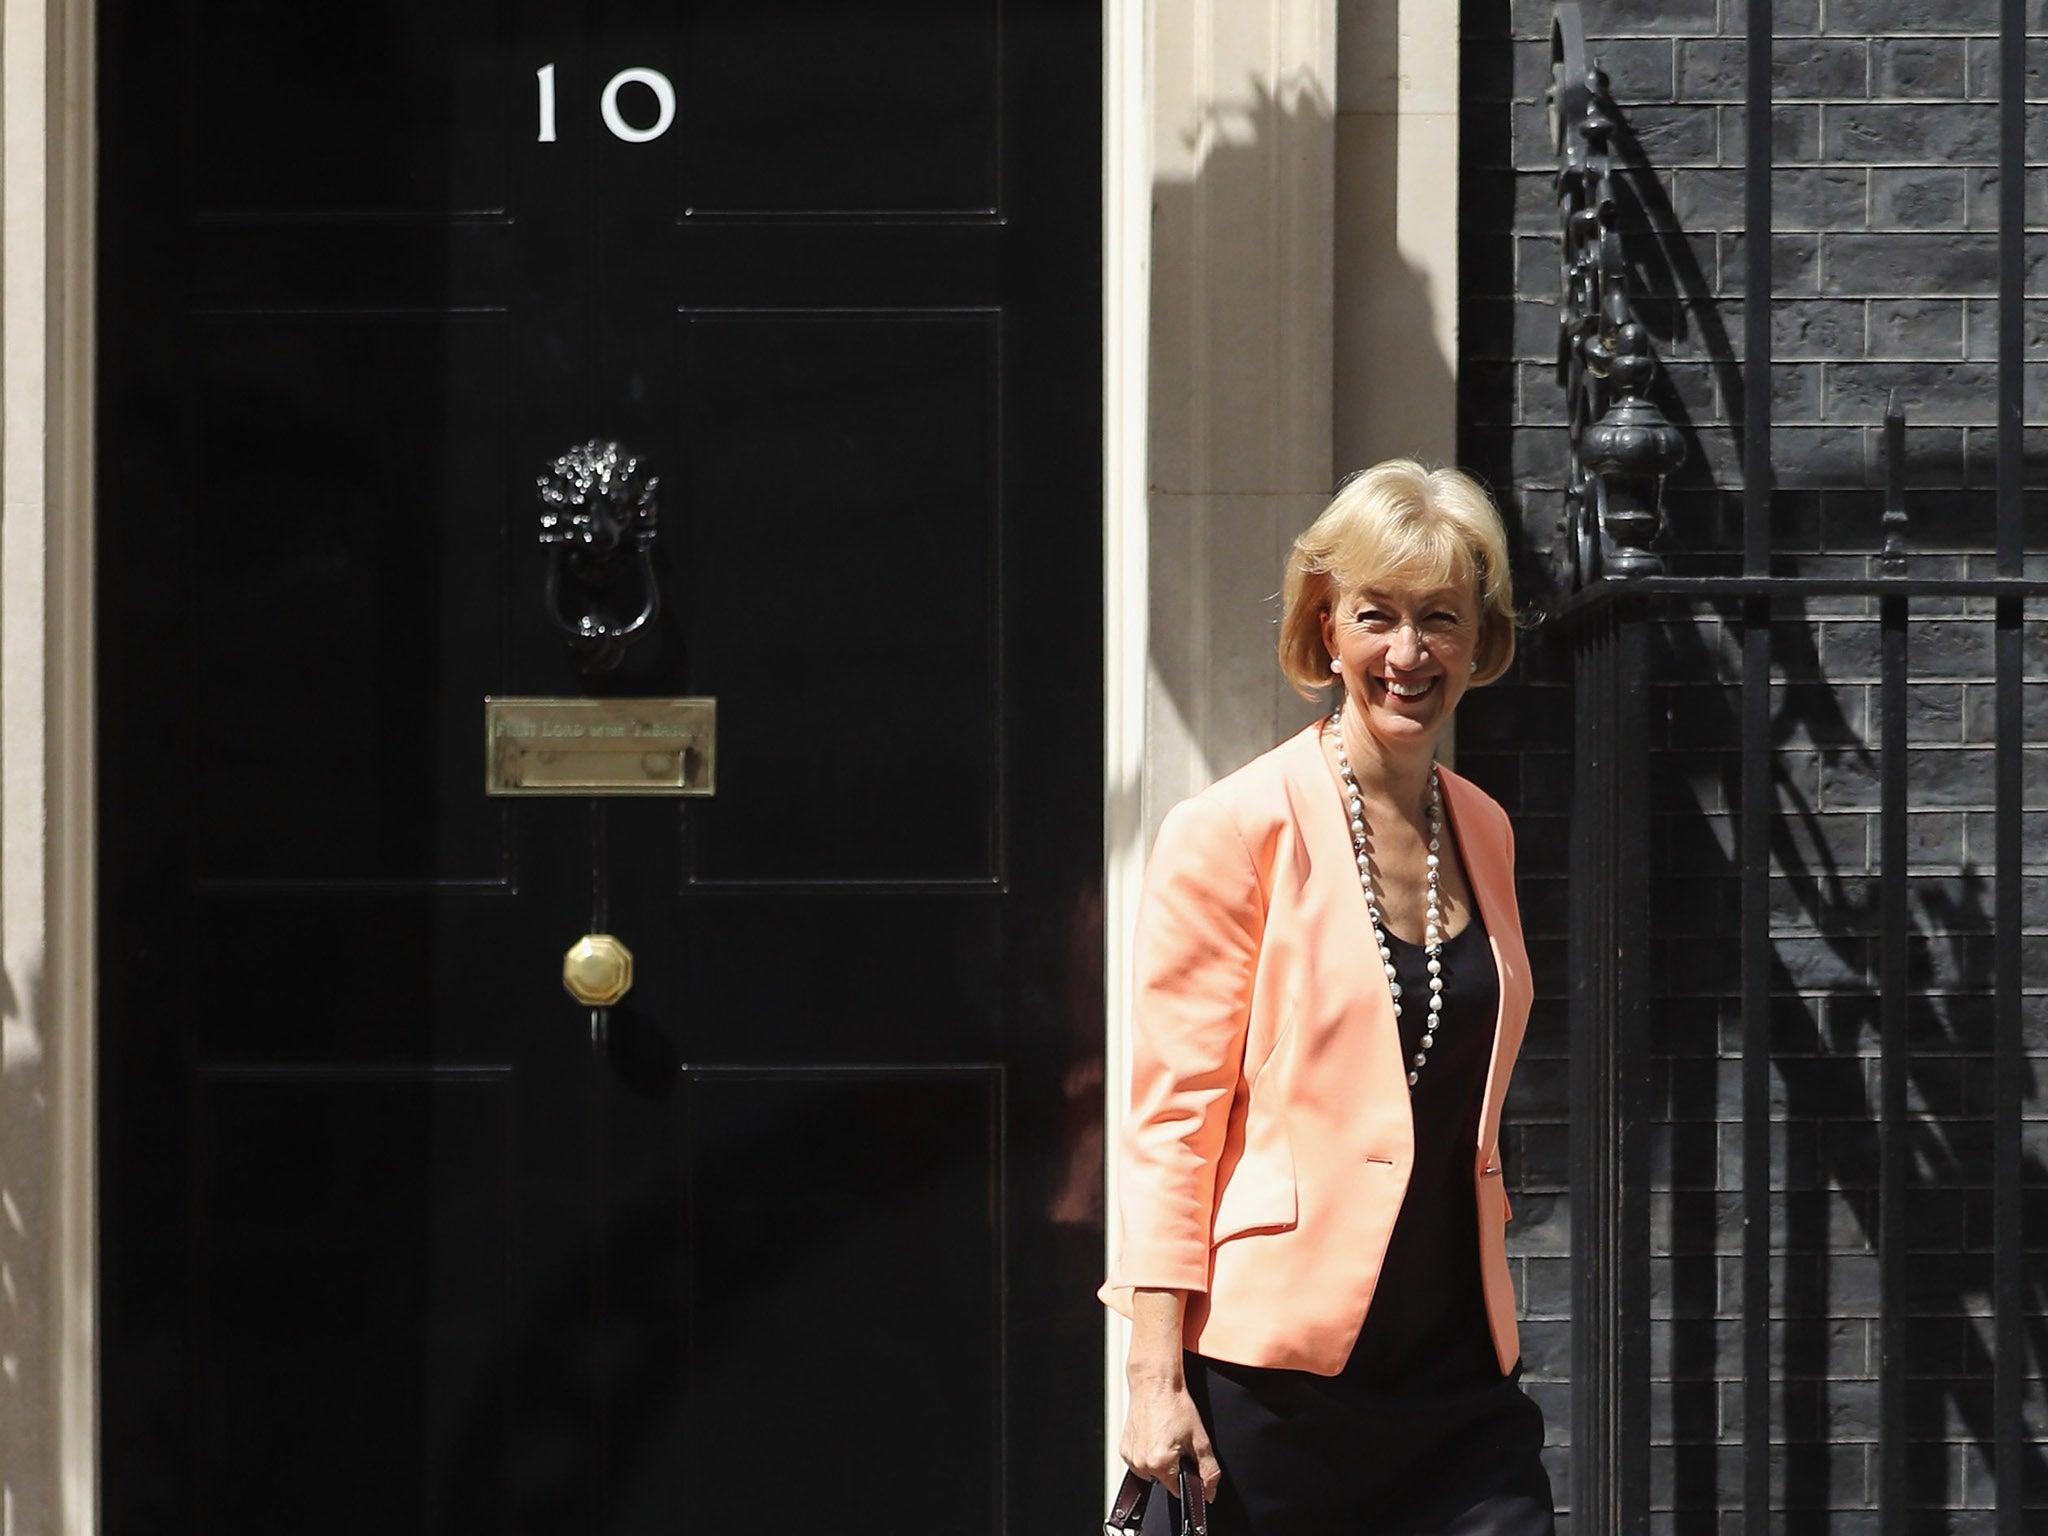 Andrea Leadsom named Defra Secretary in Theresa May Cabinet reshuffle